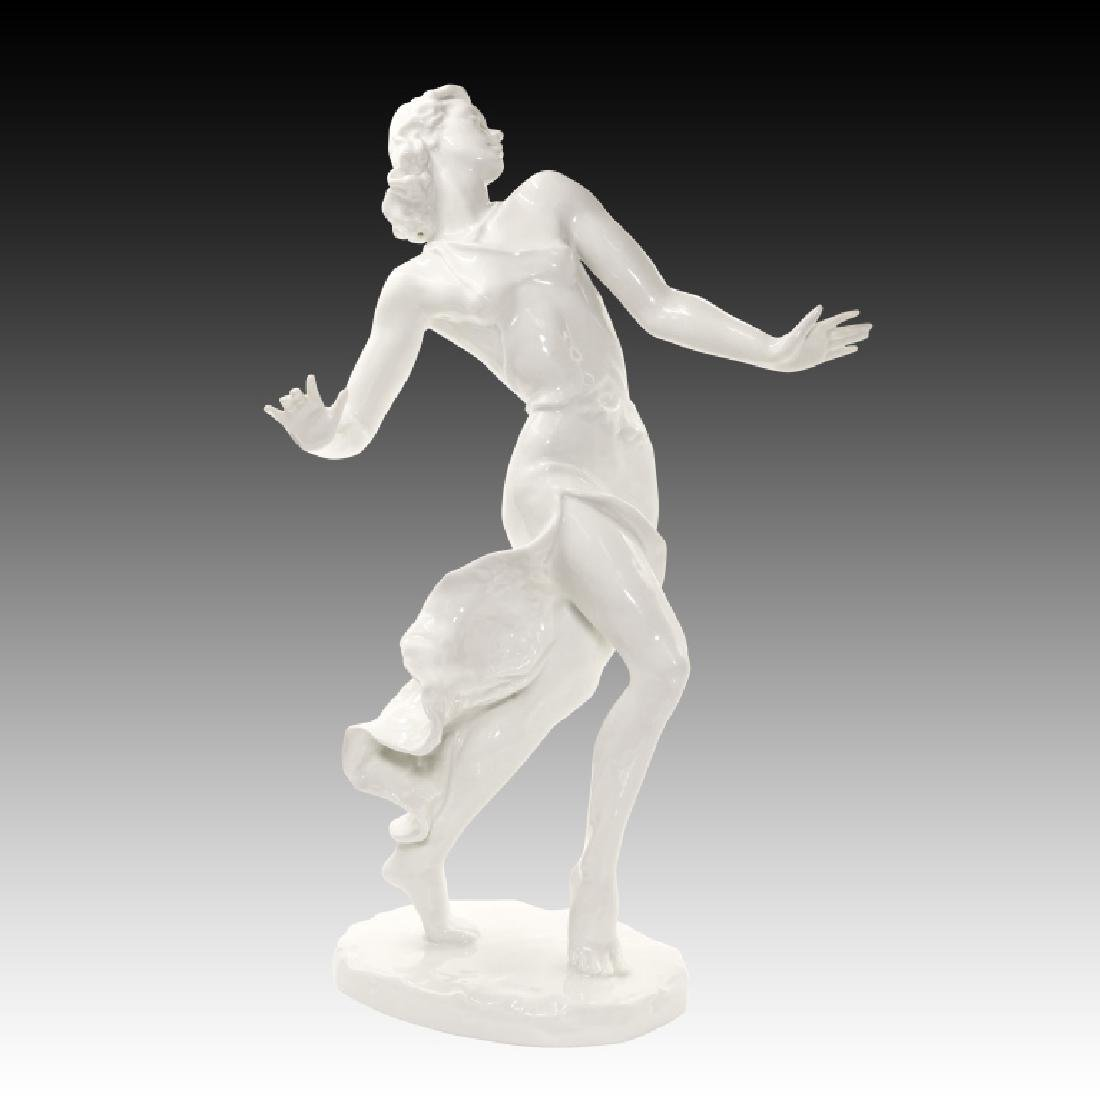 Rosenthal Large Dancing Woman Figurine